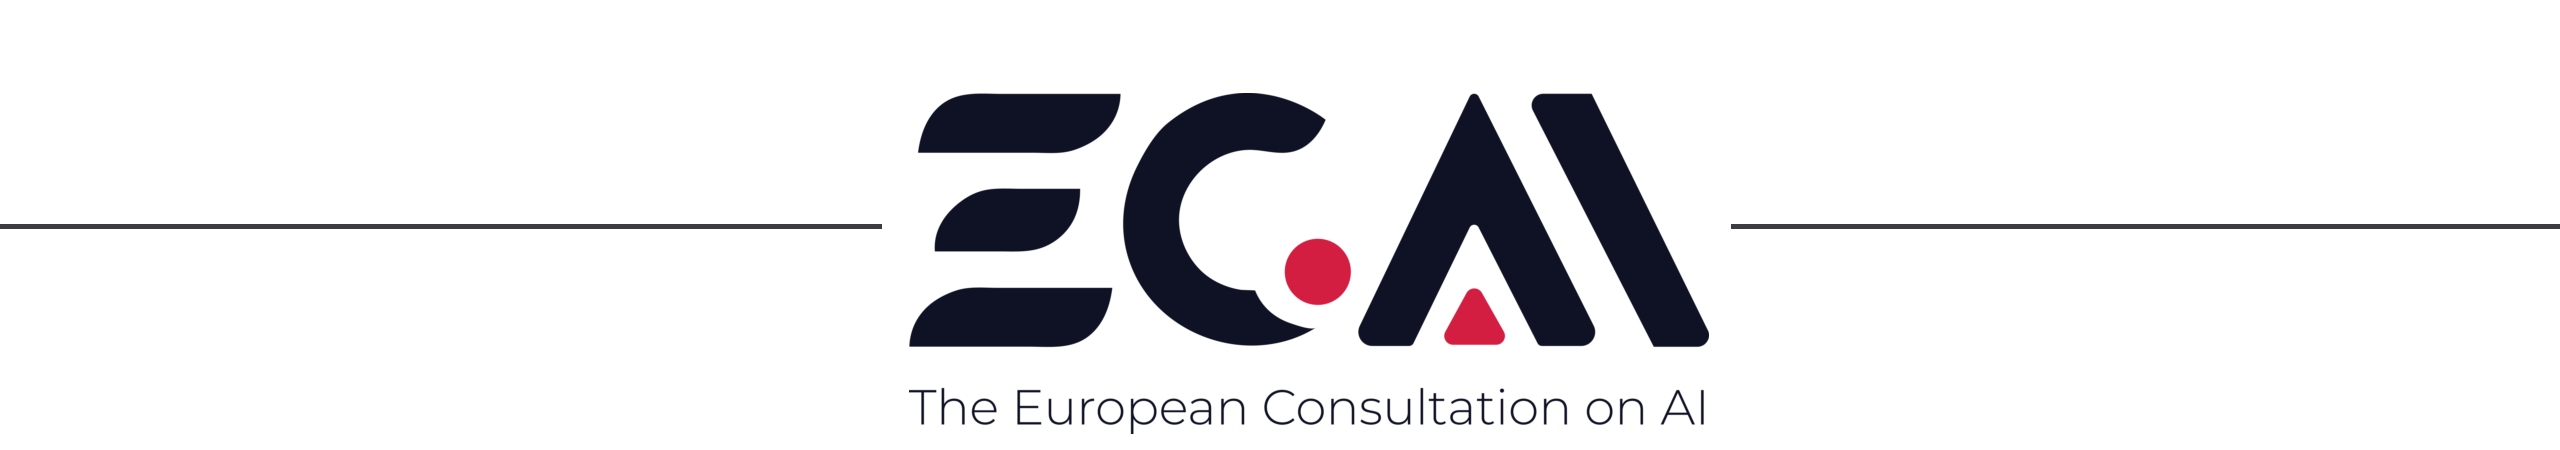 ECAI_logo_square_separator